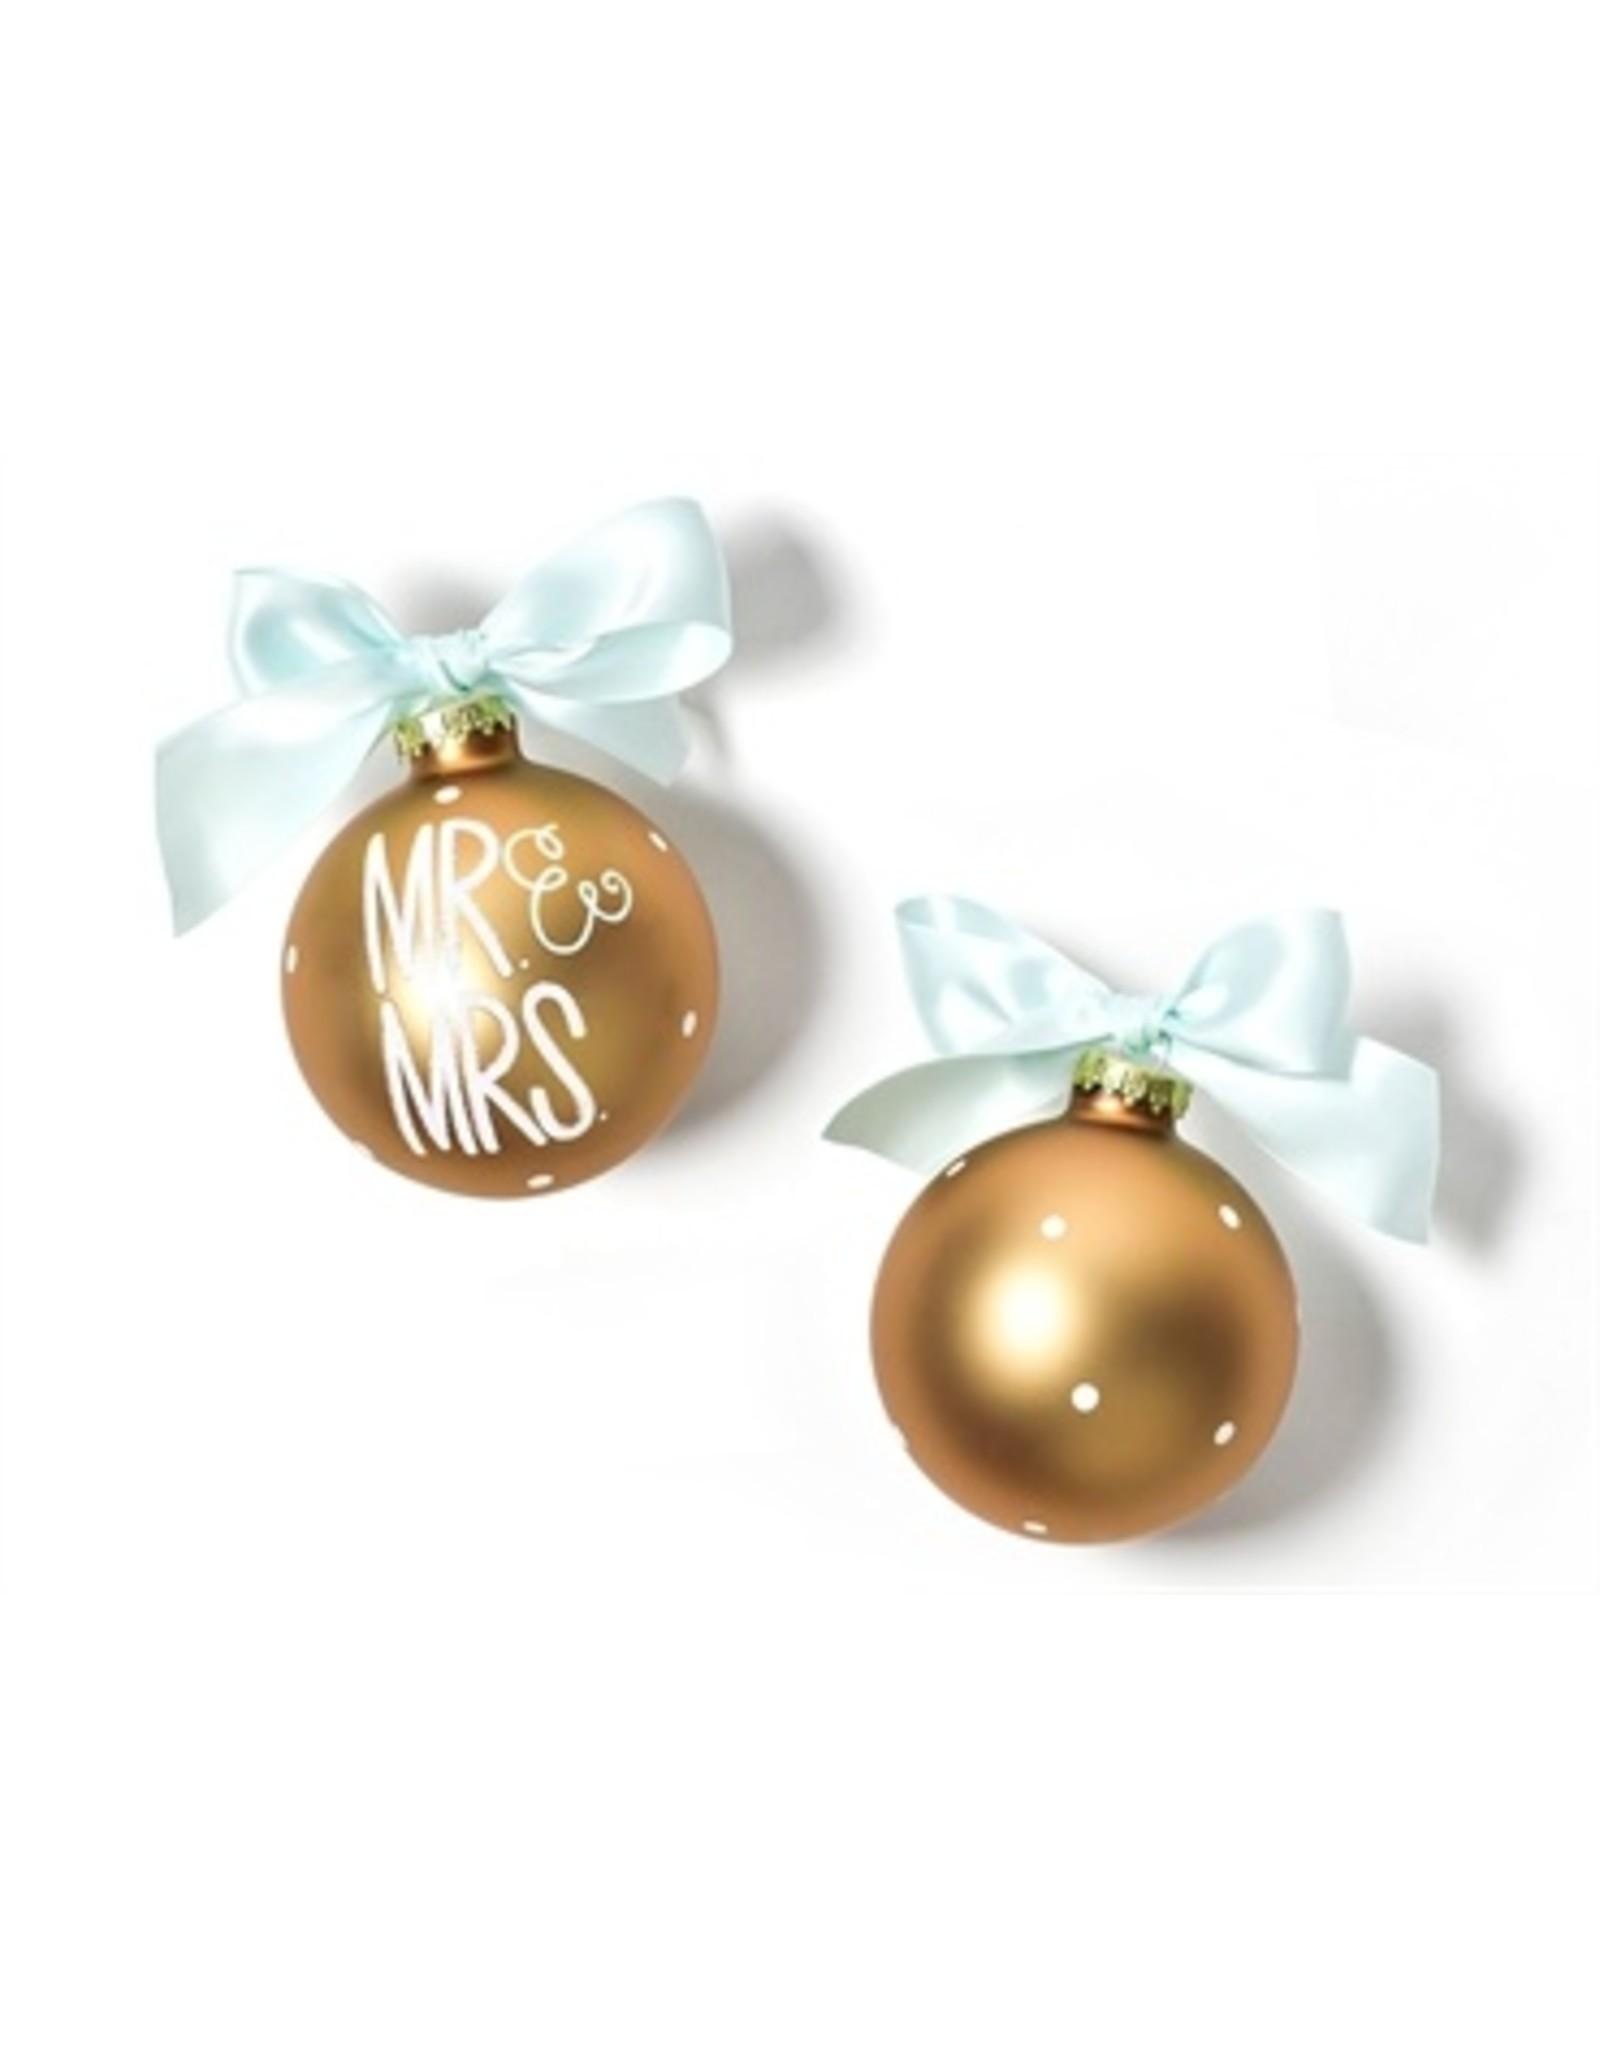 Mr & Mrs Ornament